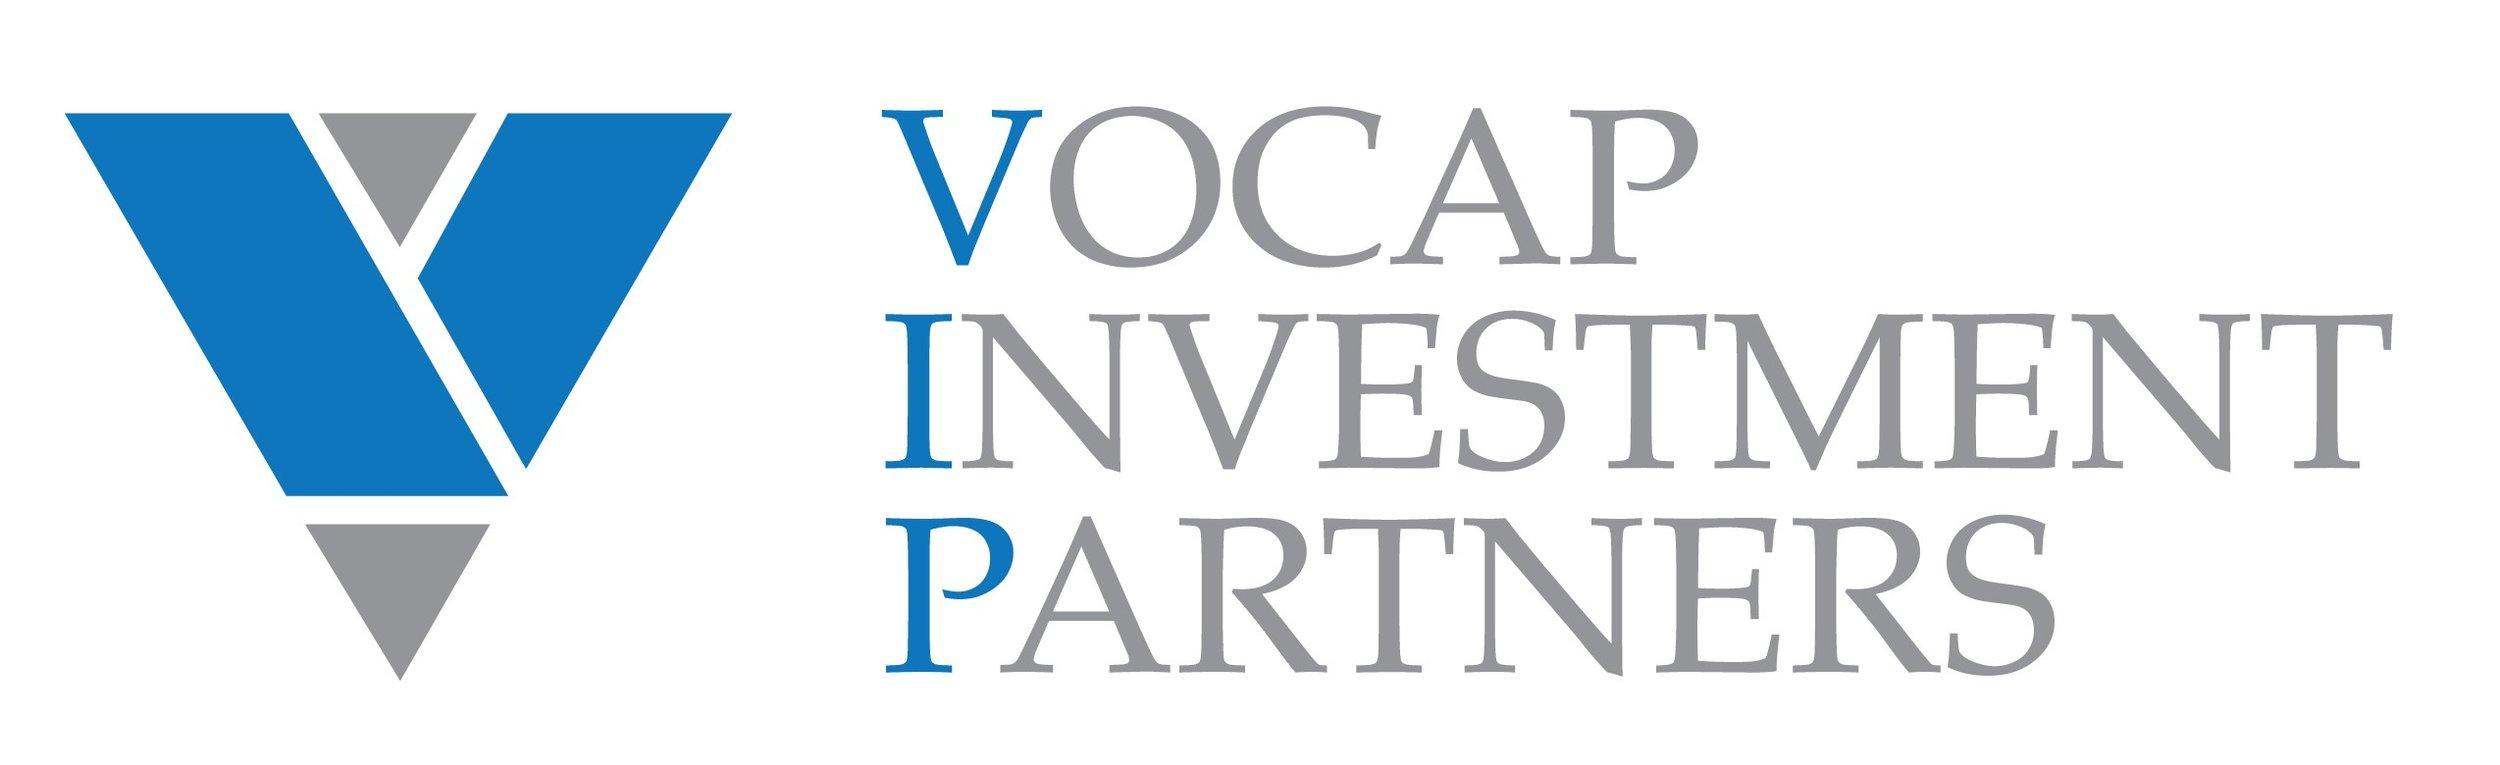 Vocap Investment Partners.jpg